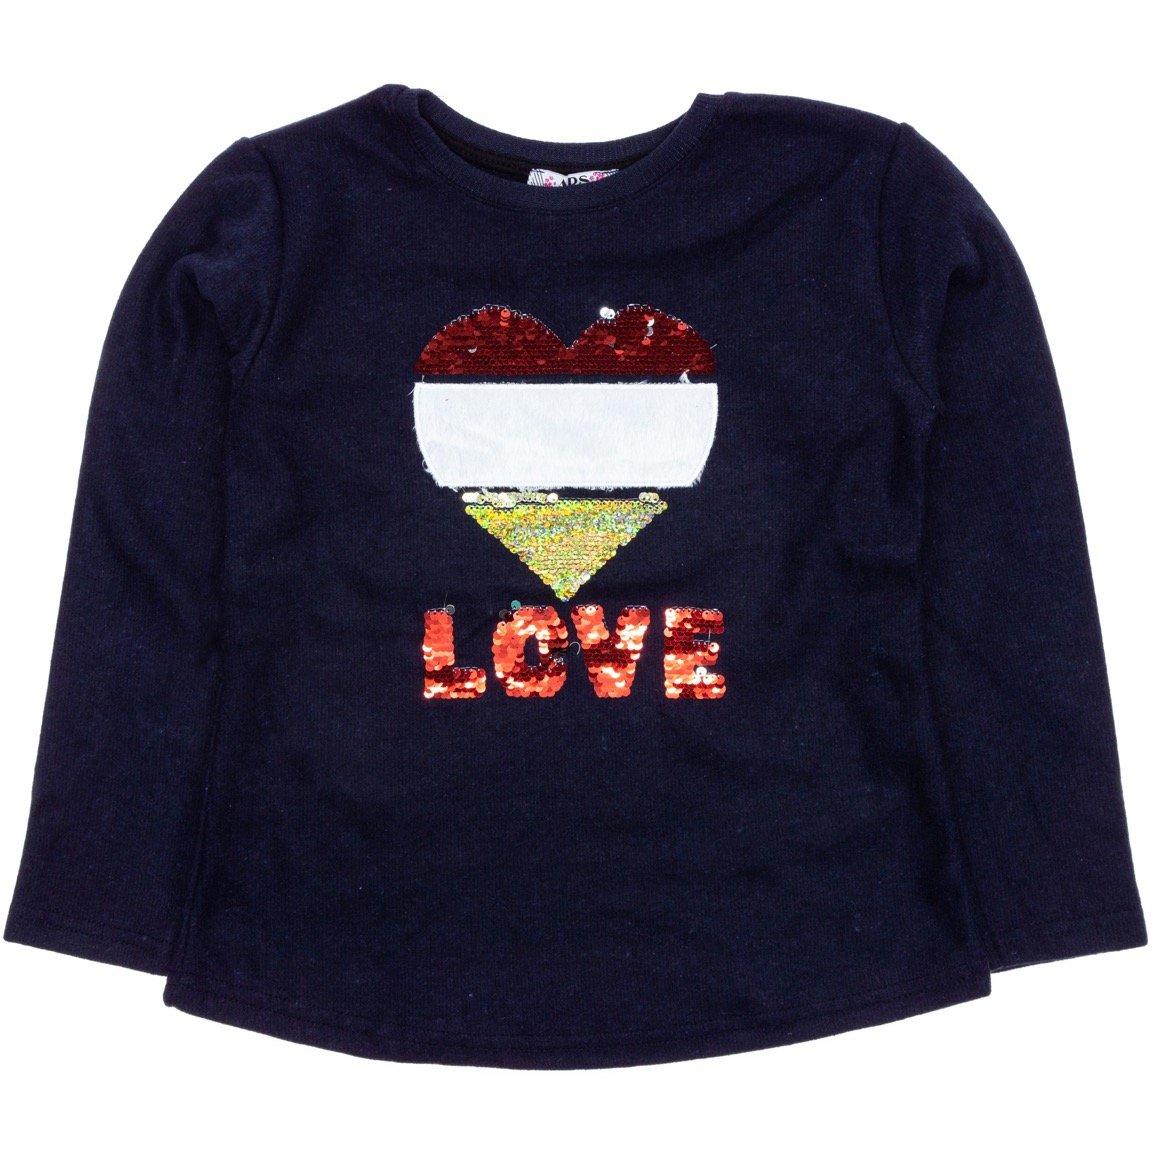 ARS παιδική μπλούζα «Love Fur»